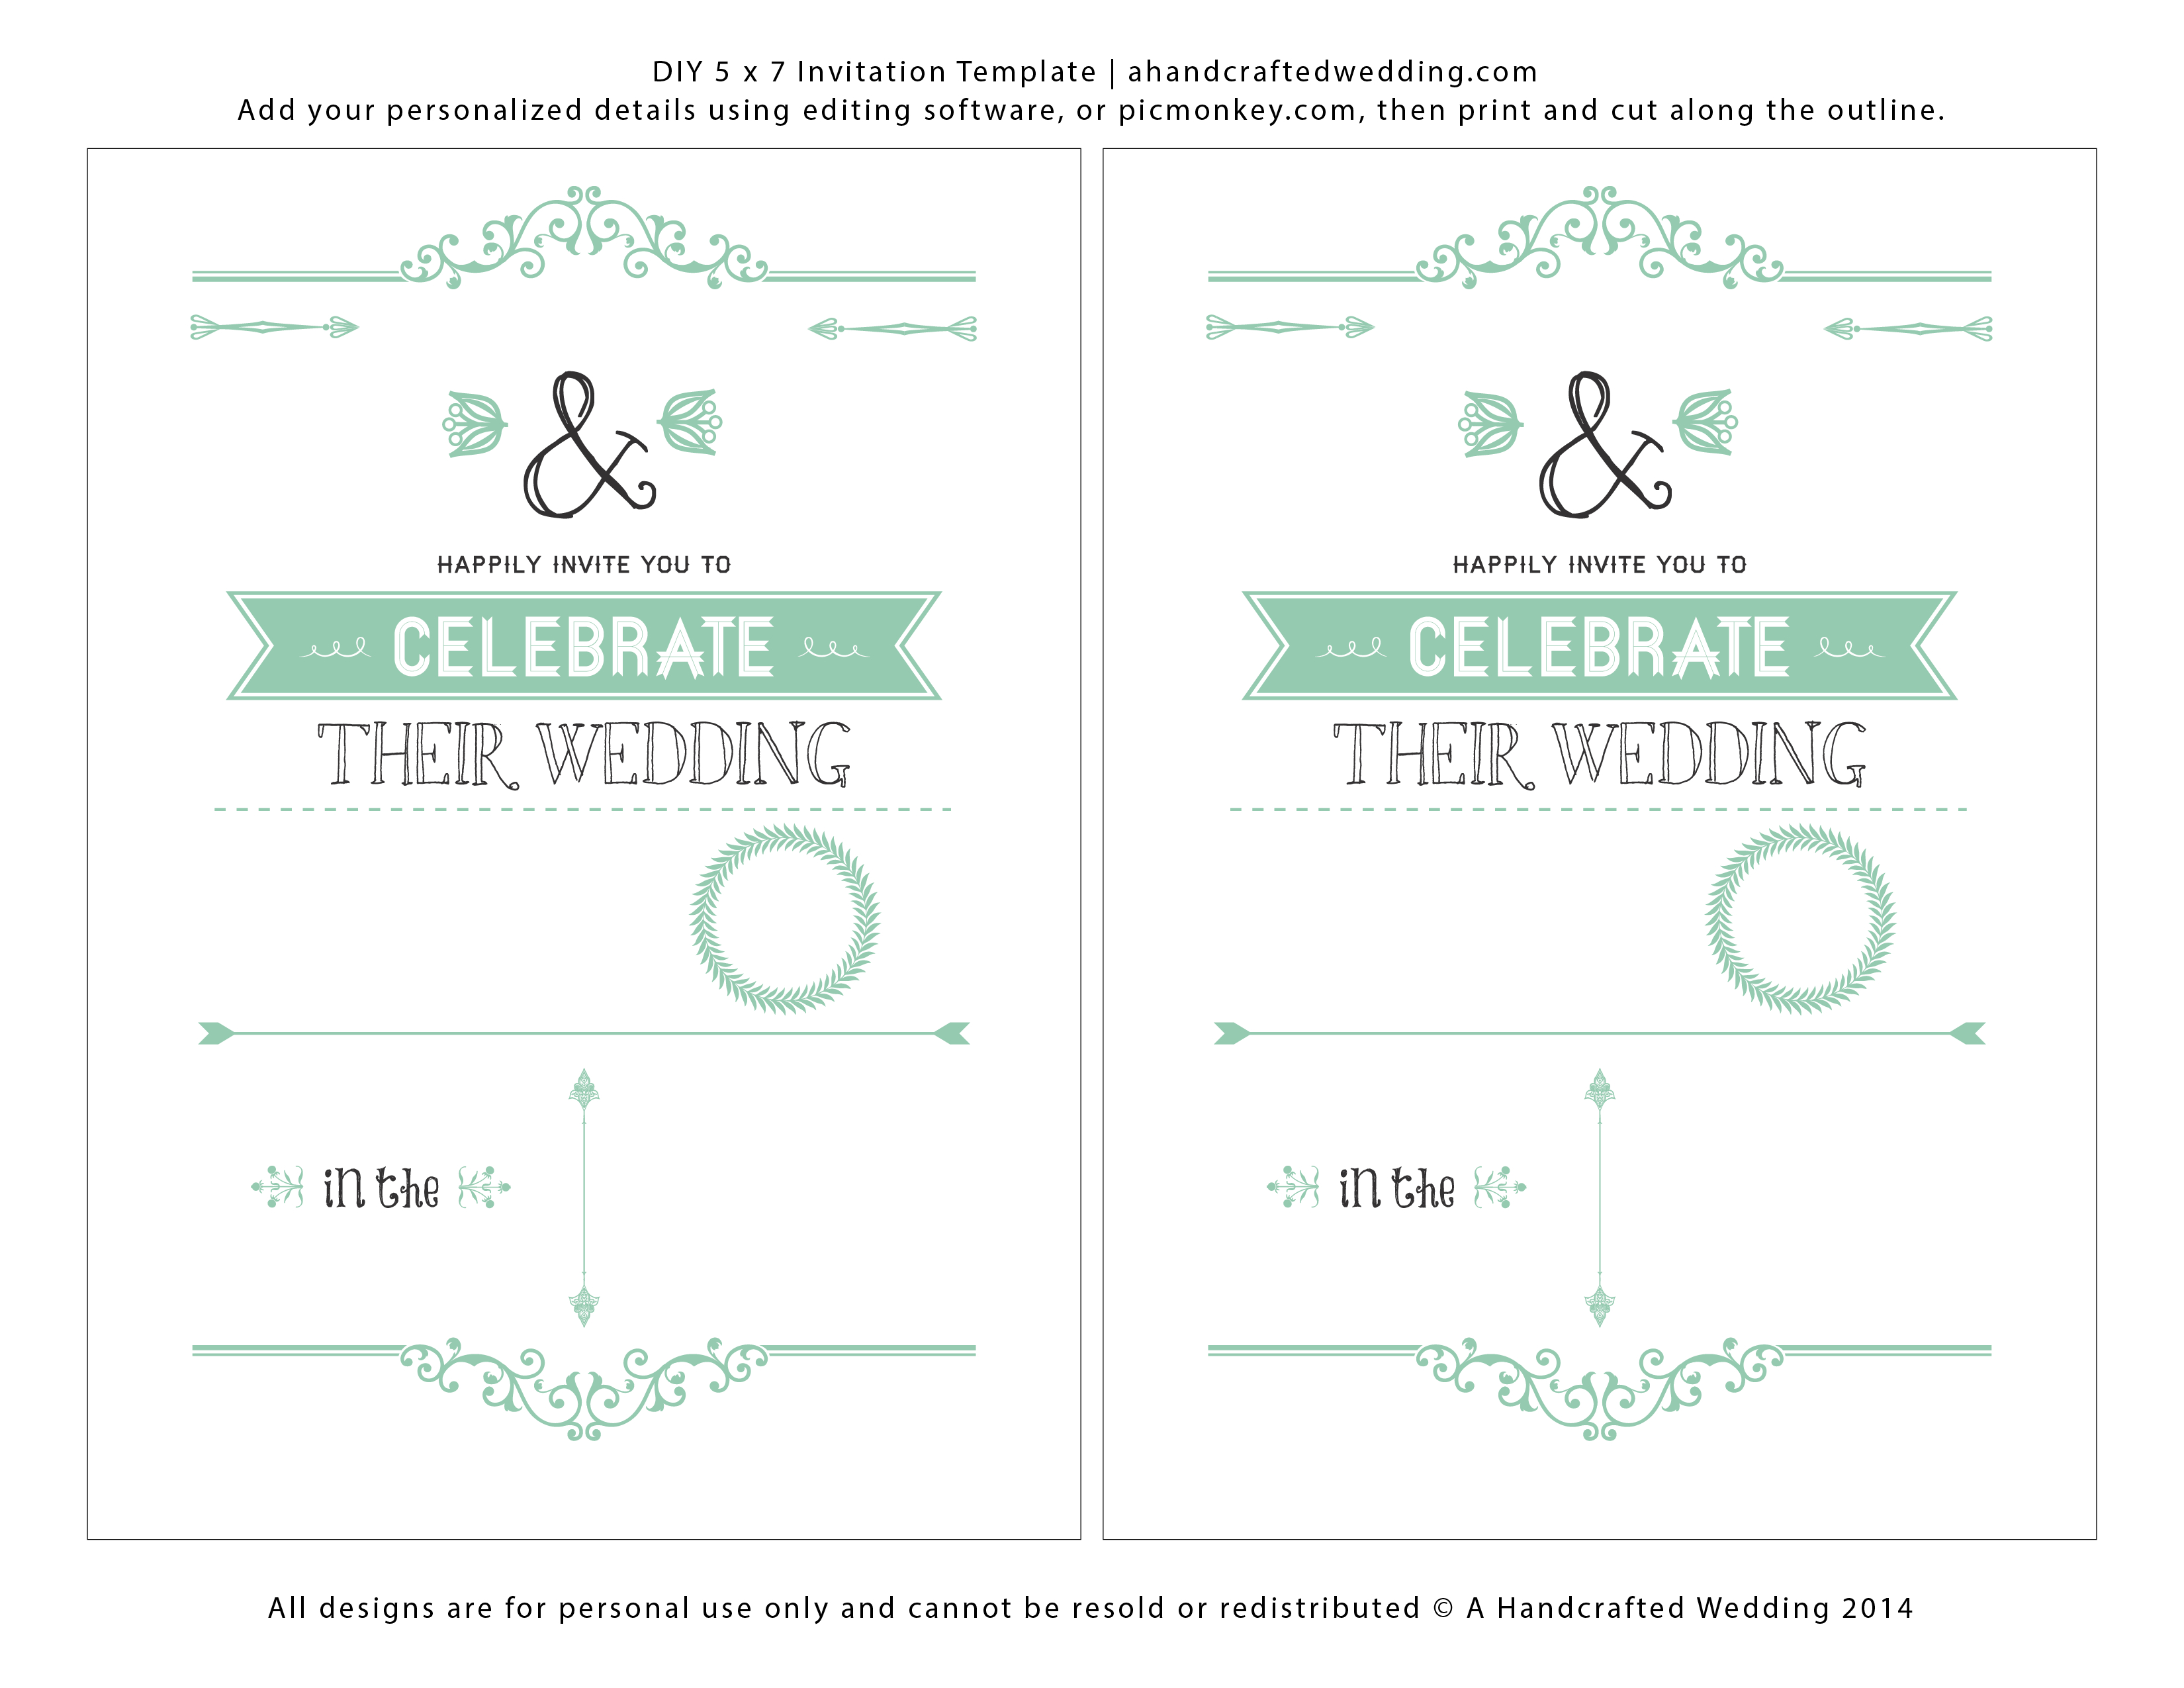 Wedding Invitation Templates Free Download | Marina Gallery Fine Art - Free Printable Wedding Invitations Templates Downloads